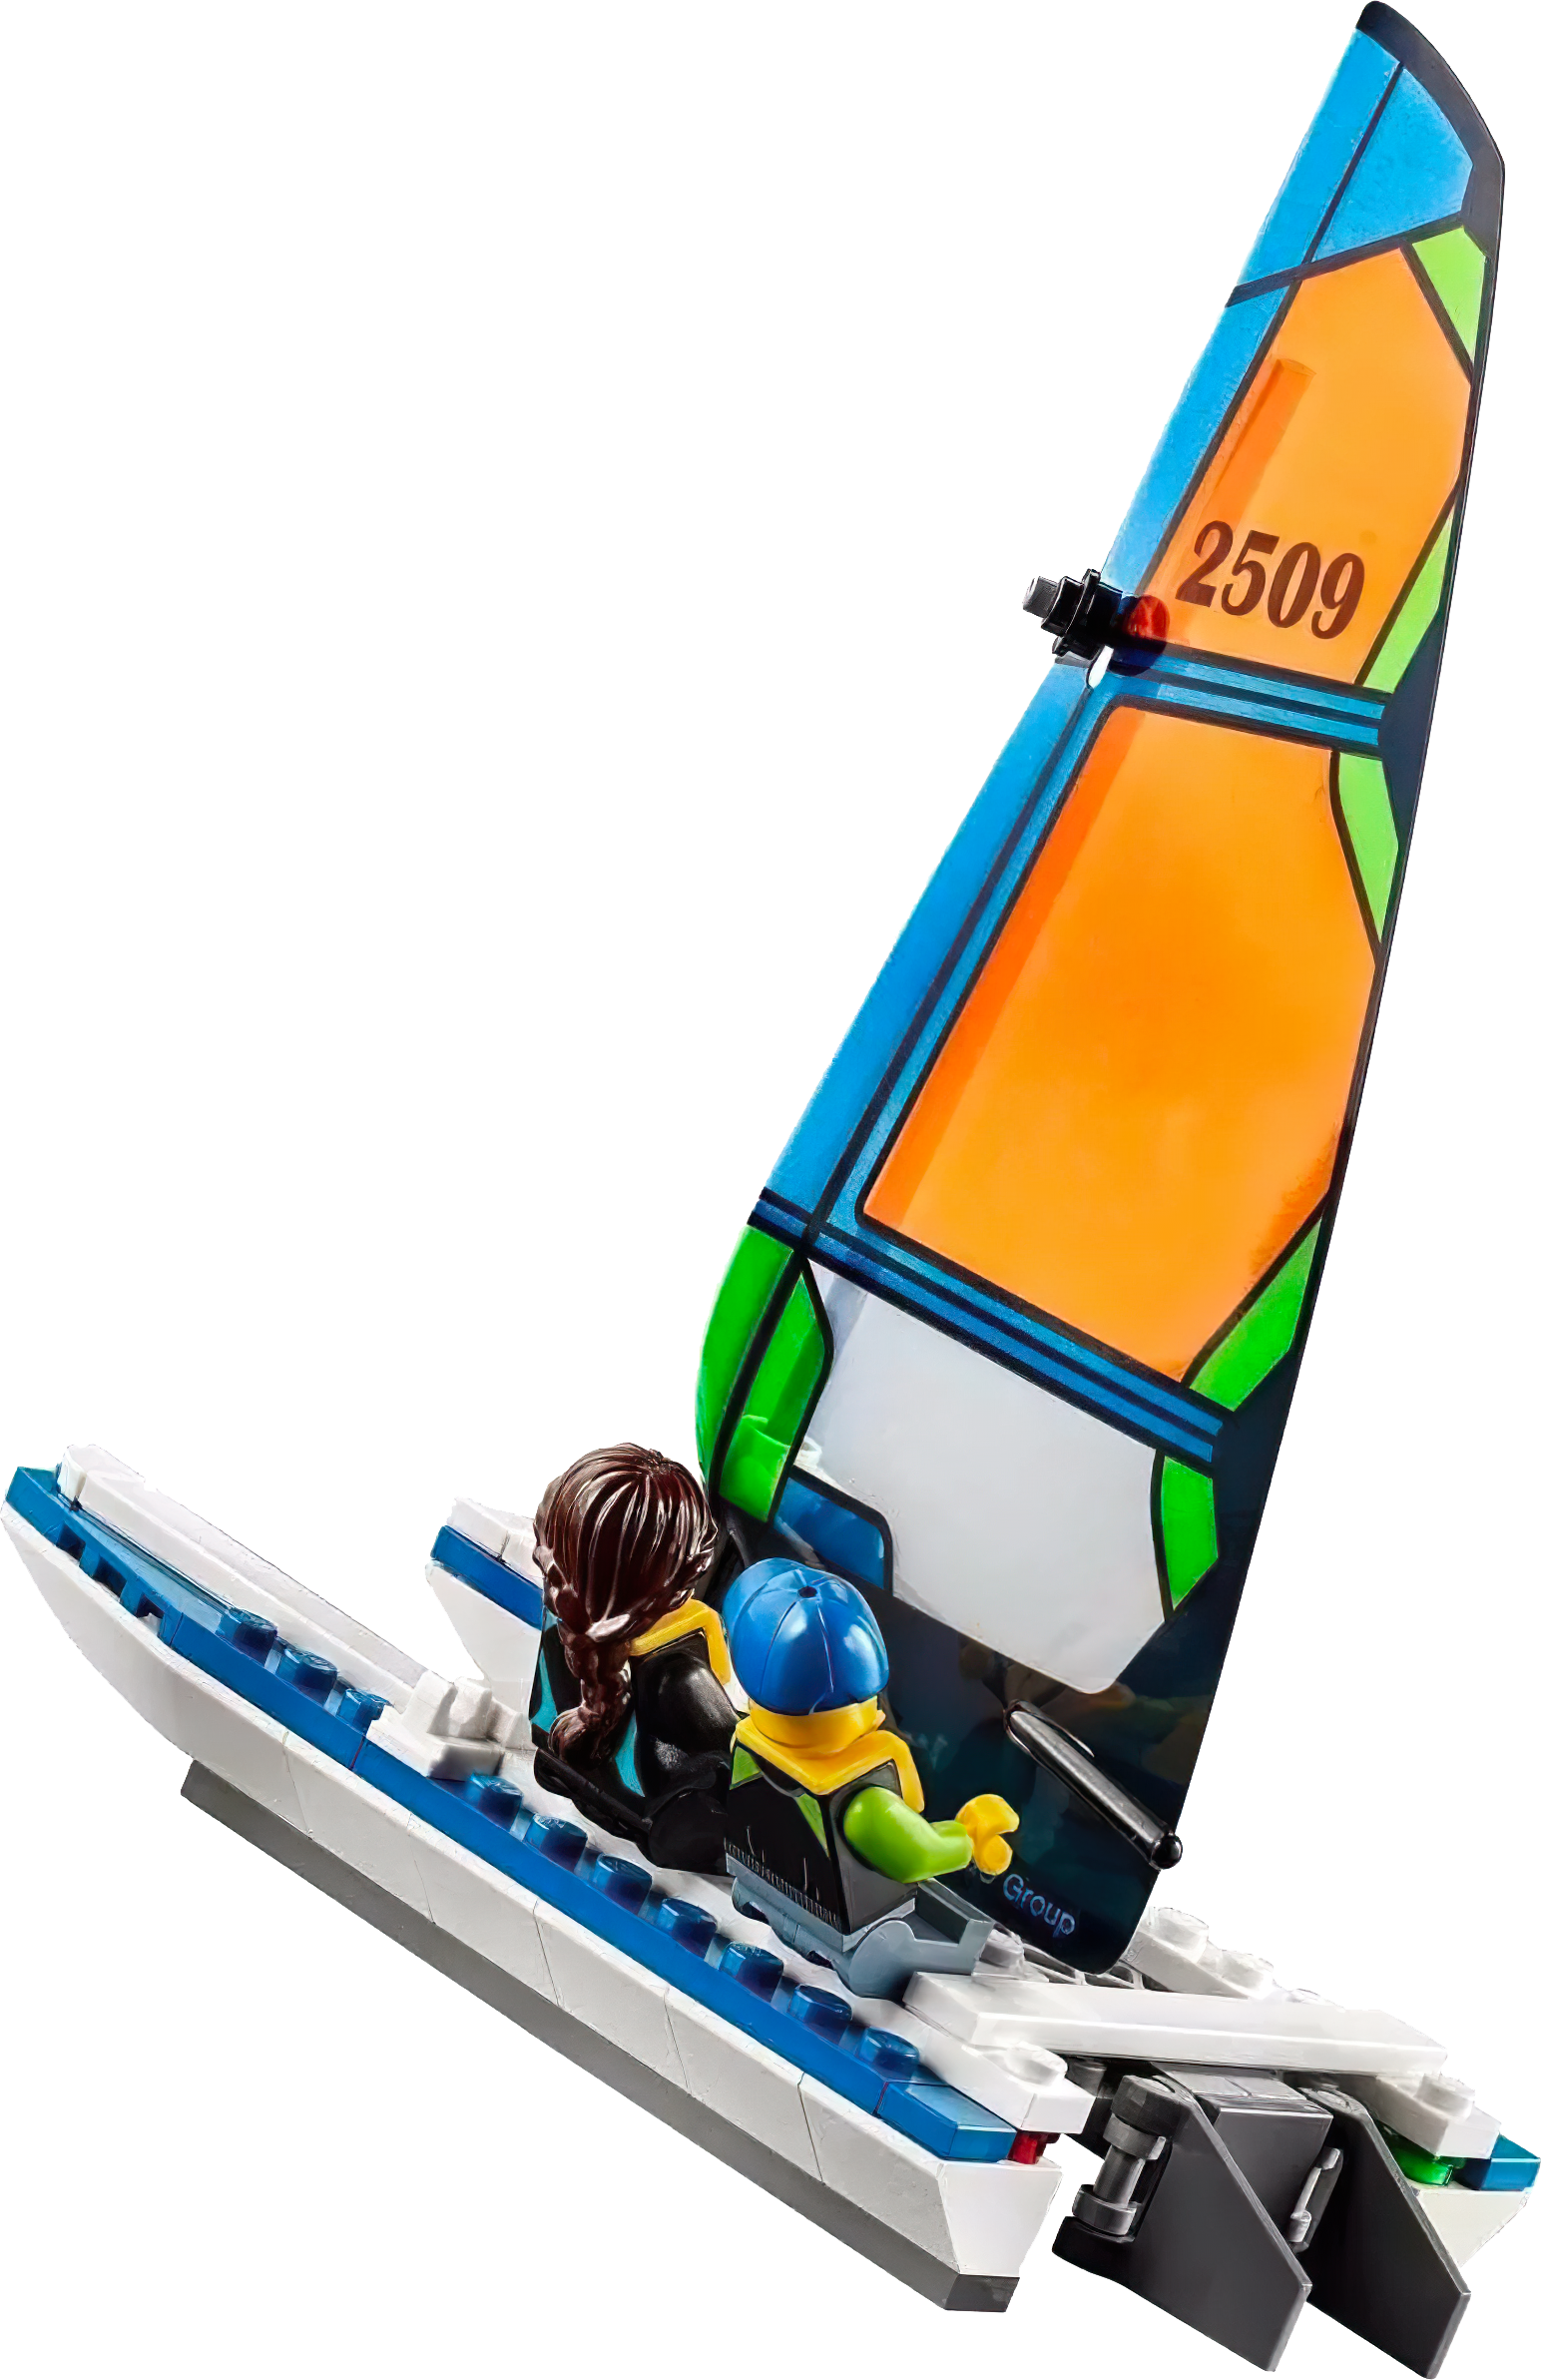 4x4 with Catamaran